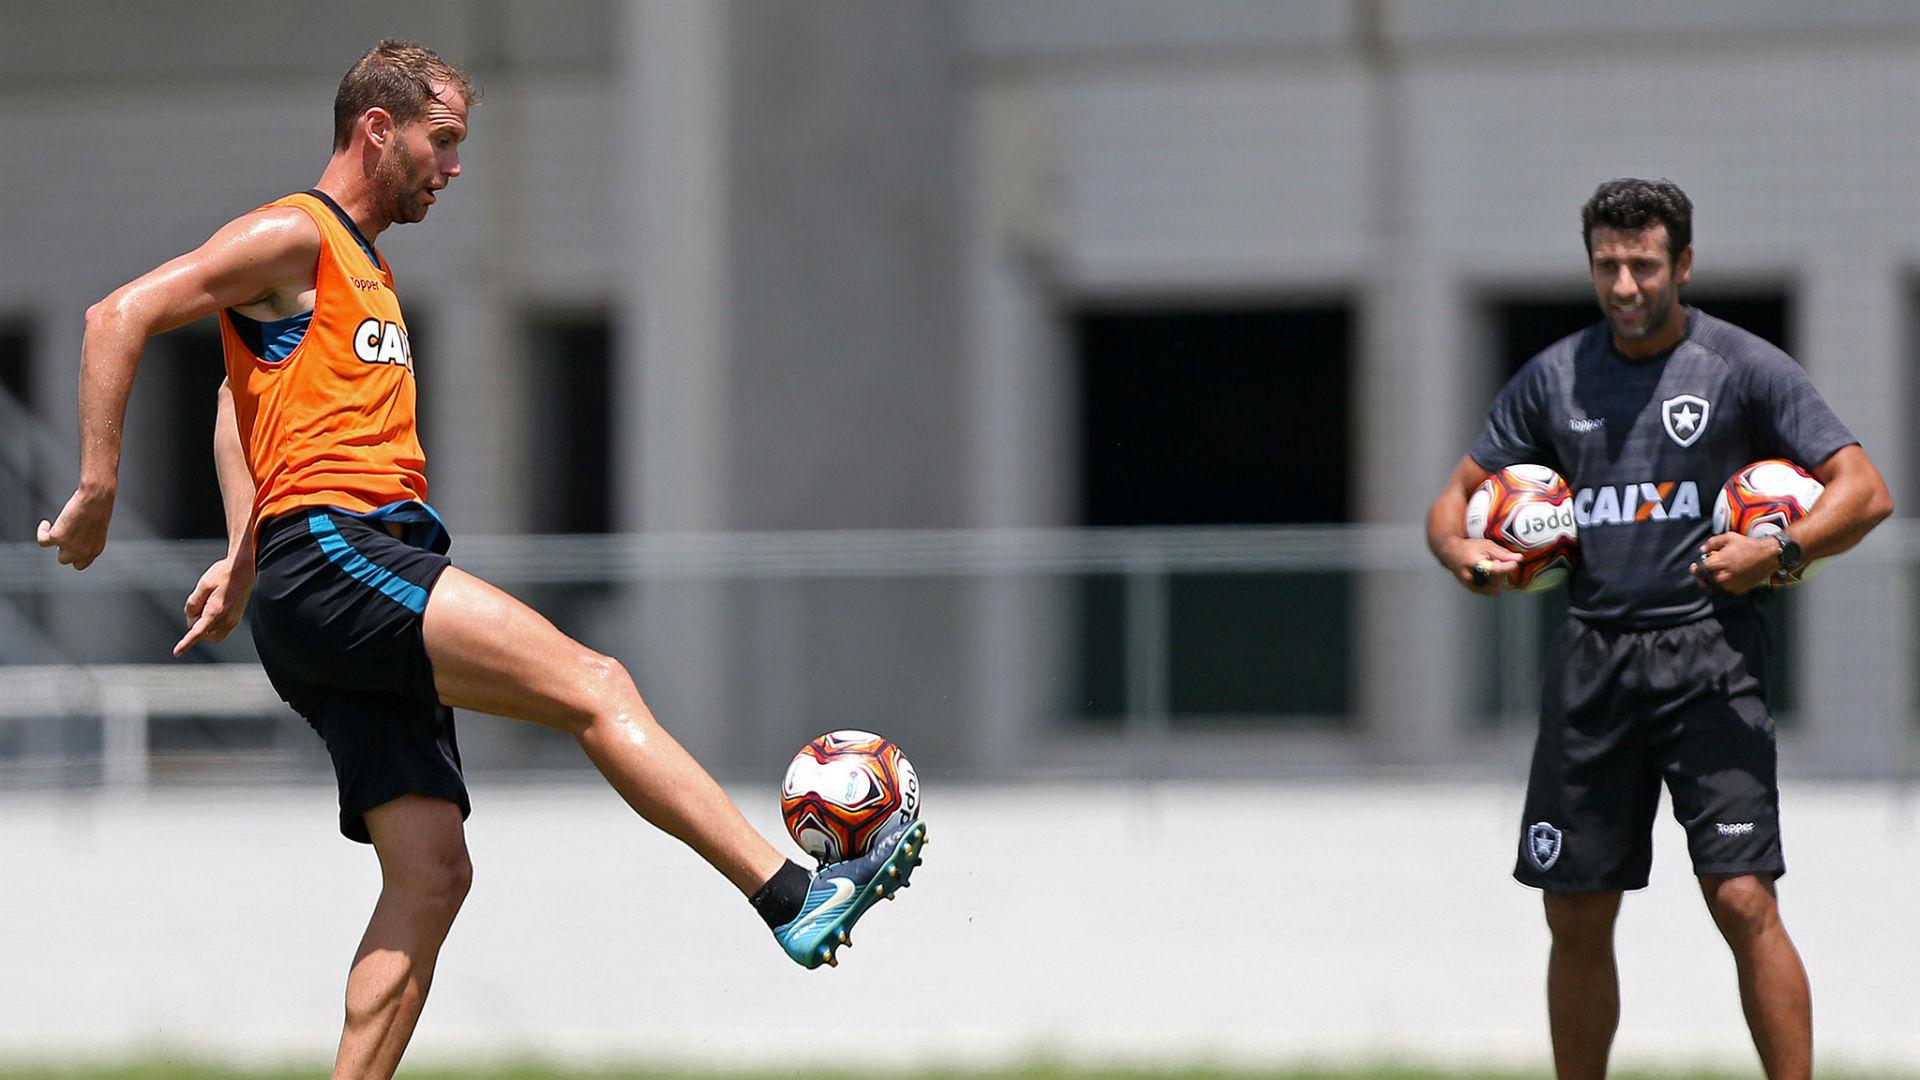 Joel Carli Alberto Valentim Botafogo treino 24 03 2018